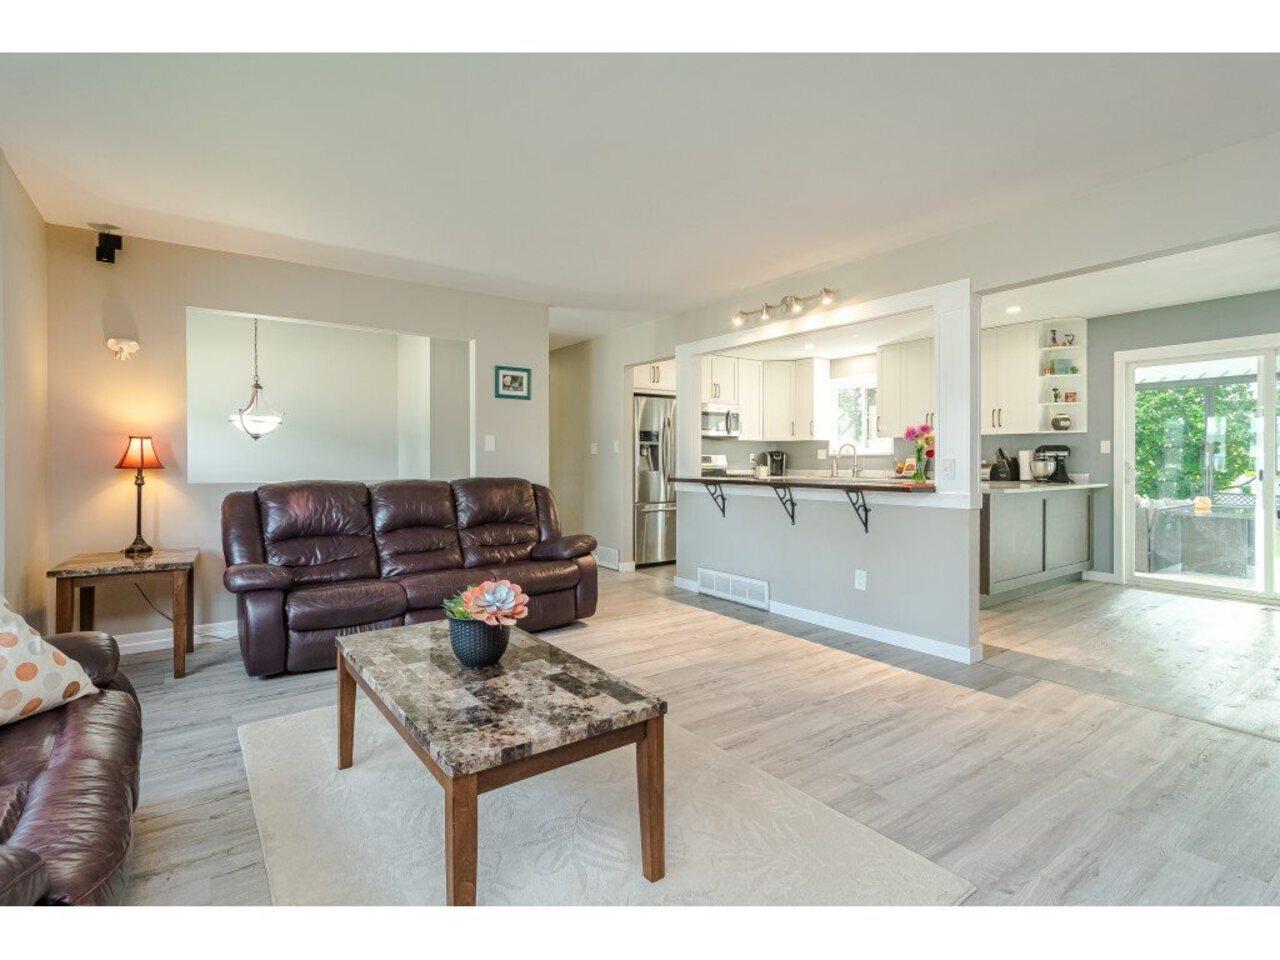 26882-32a-avenue-aldergrove-langley-langley-09 at 26882 32a Avenue, Aldergrove Langley, Langley